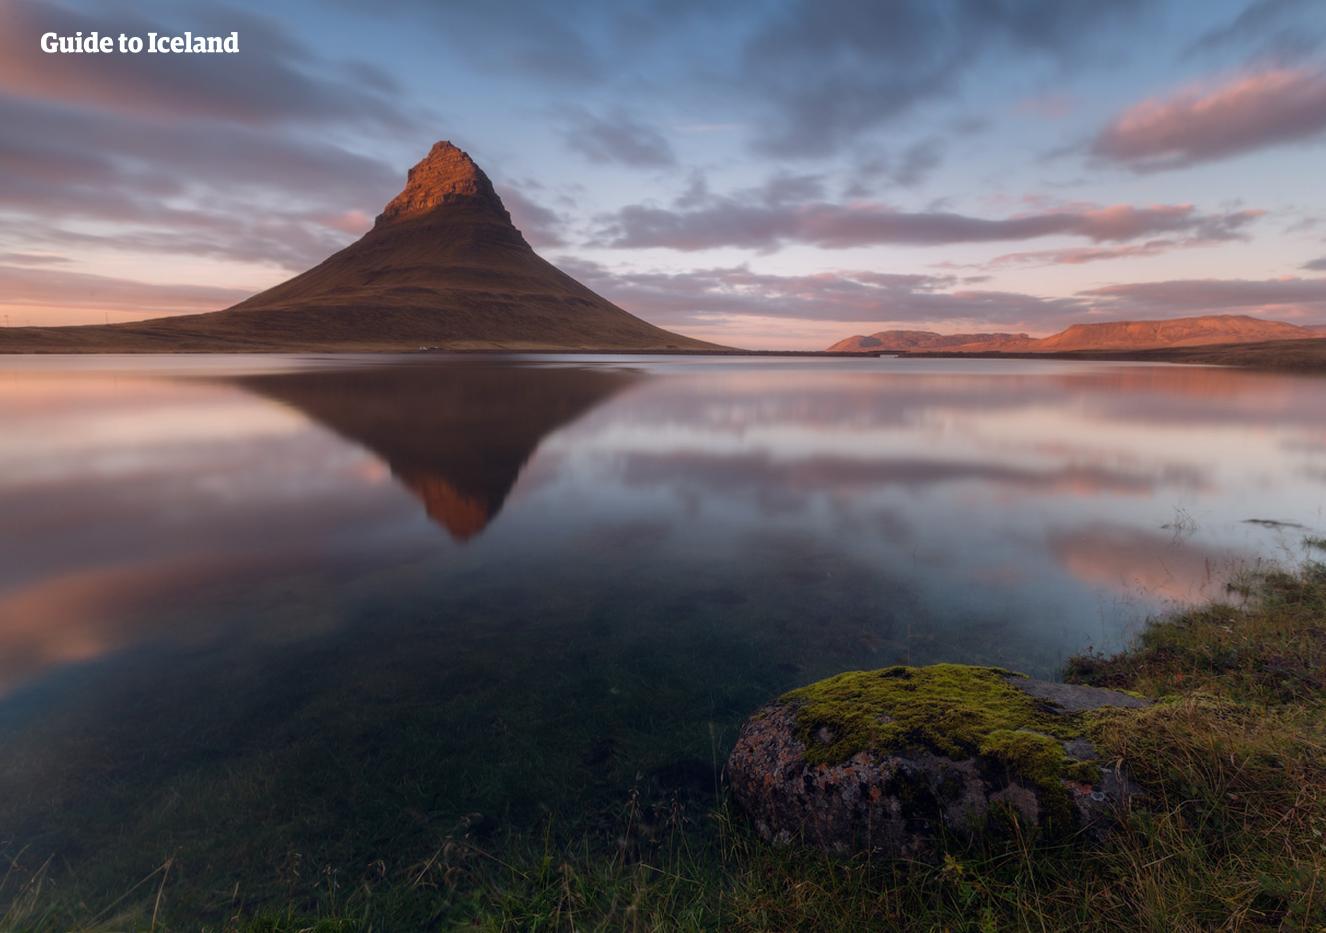 Bjerget Kirkjufell spejlet i en sø en midsommernat i Island.